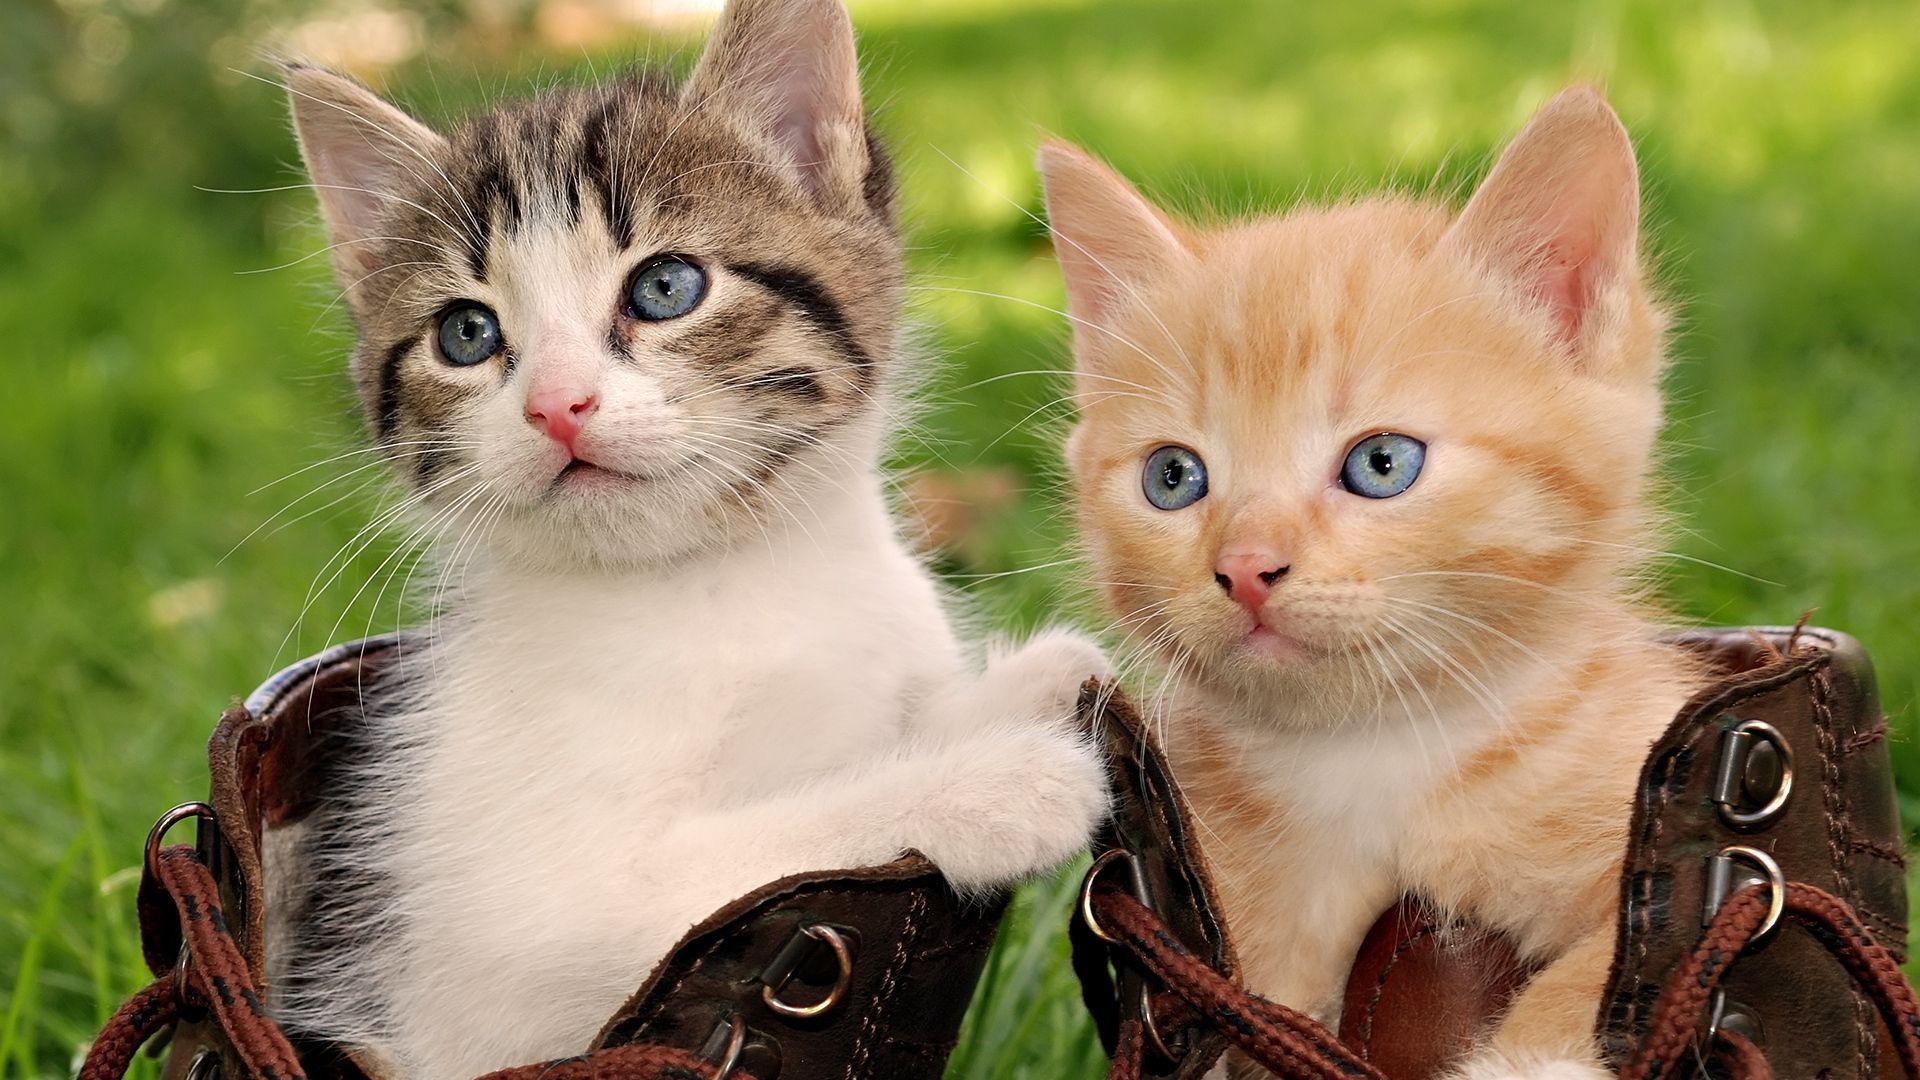 Cute Cats Wallpaper Hd Hd Wallpapers 1080p Download Full Hd Wallpaper Download In 2020 Baby Cats Cute Animals Puppies Cute Animal Videos